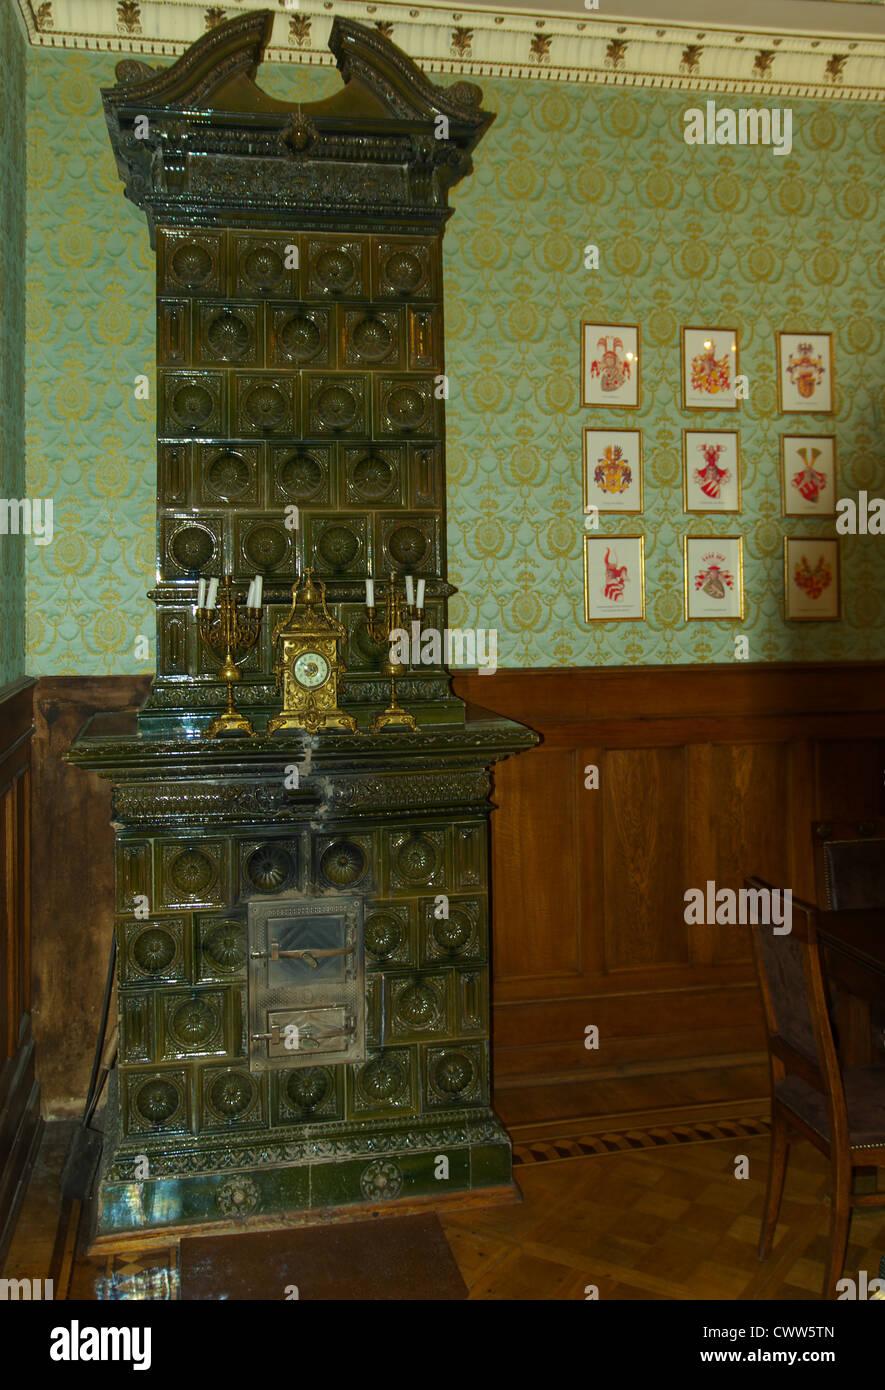 Tiled stove. - Stock Image